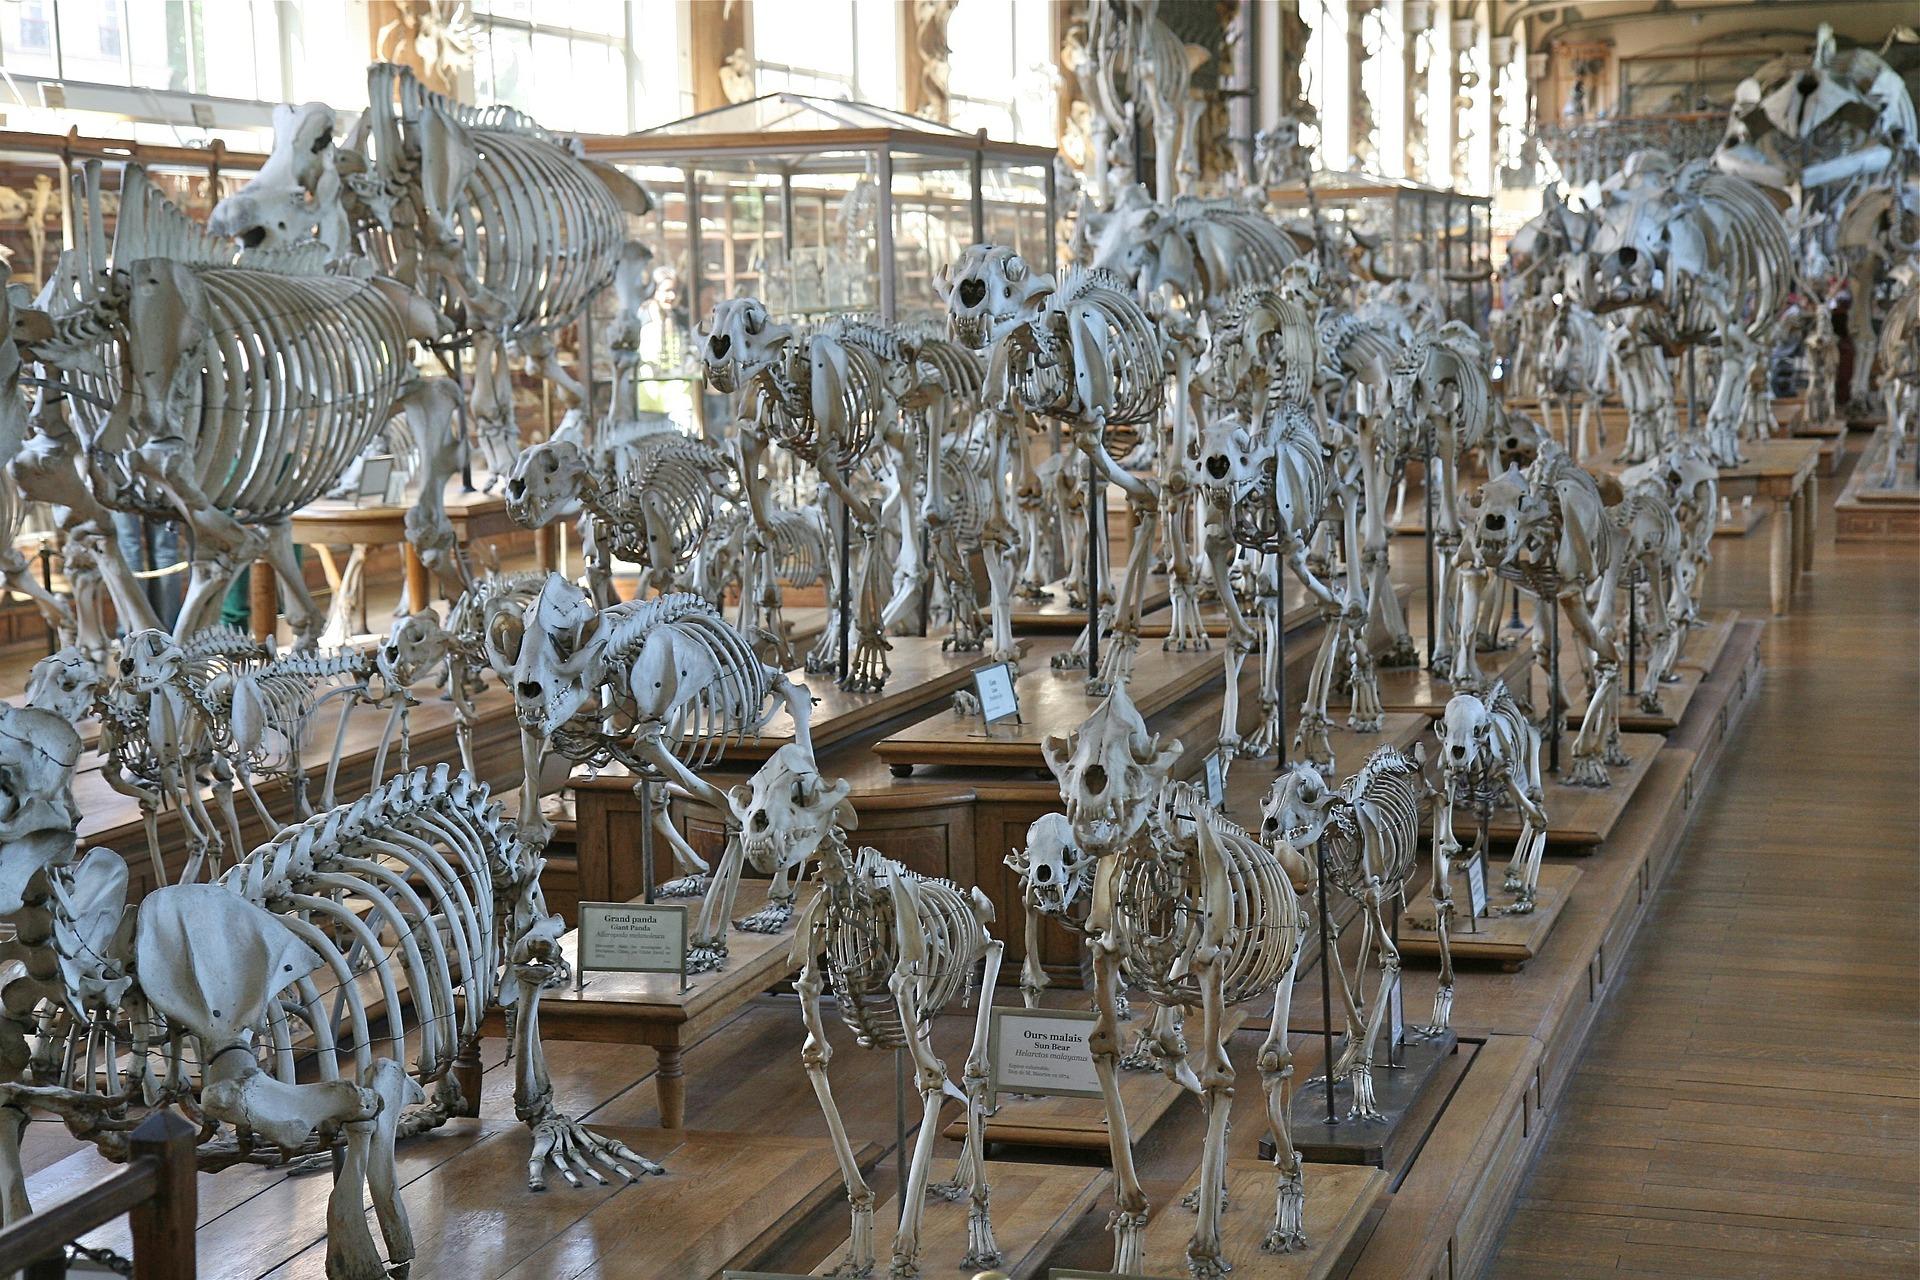 the Darwin museum